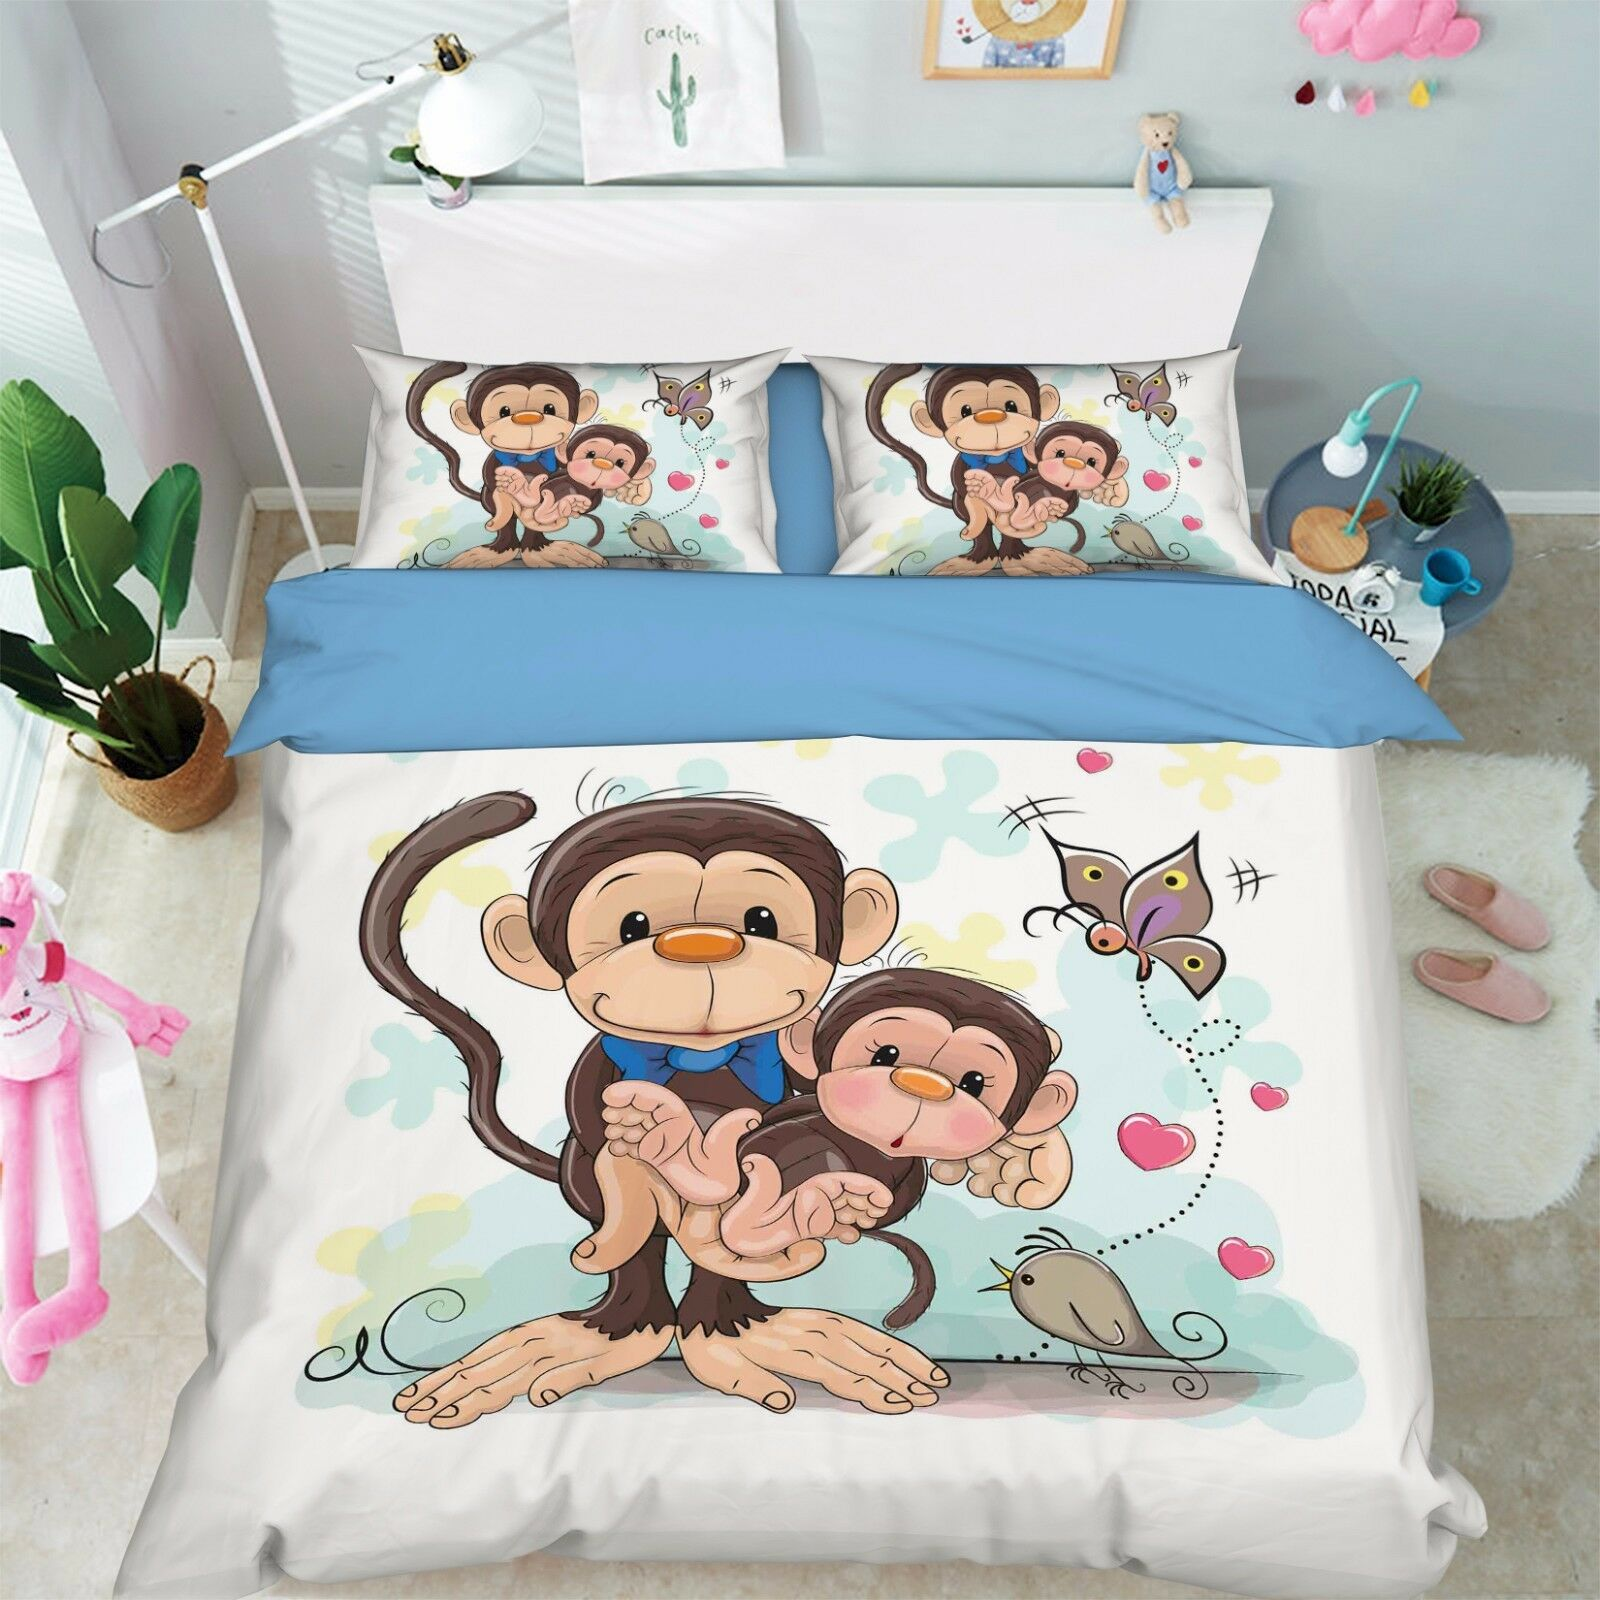 3D Monkey Anime 908 Bed Pillowcases Quilt Duvet Cover Set Single Queen UK Summer